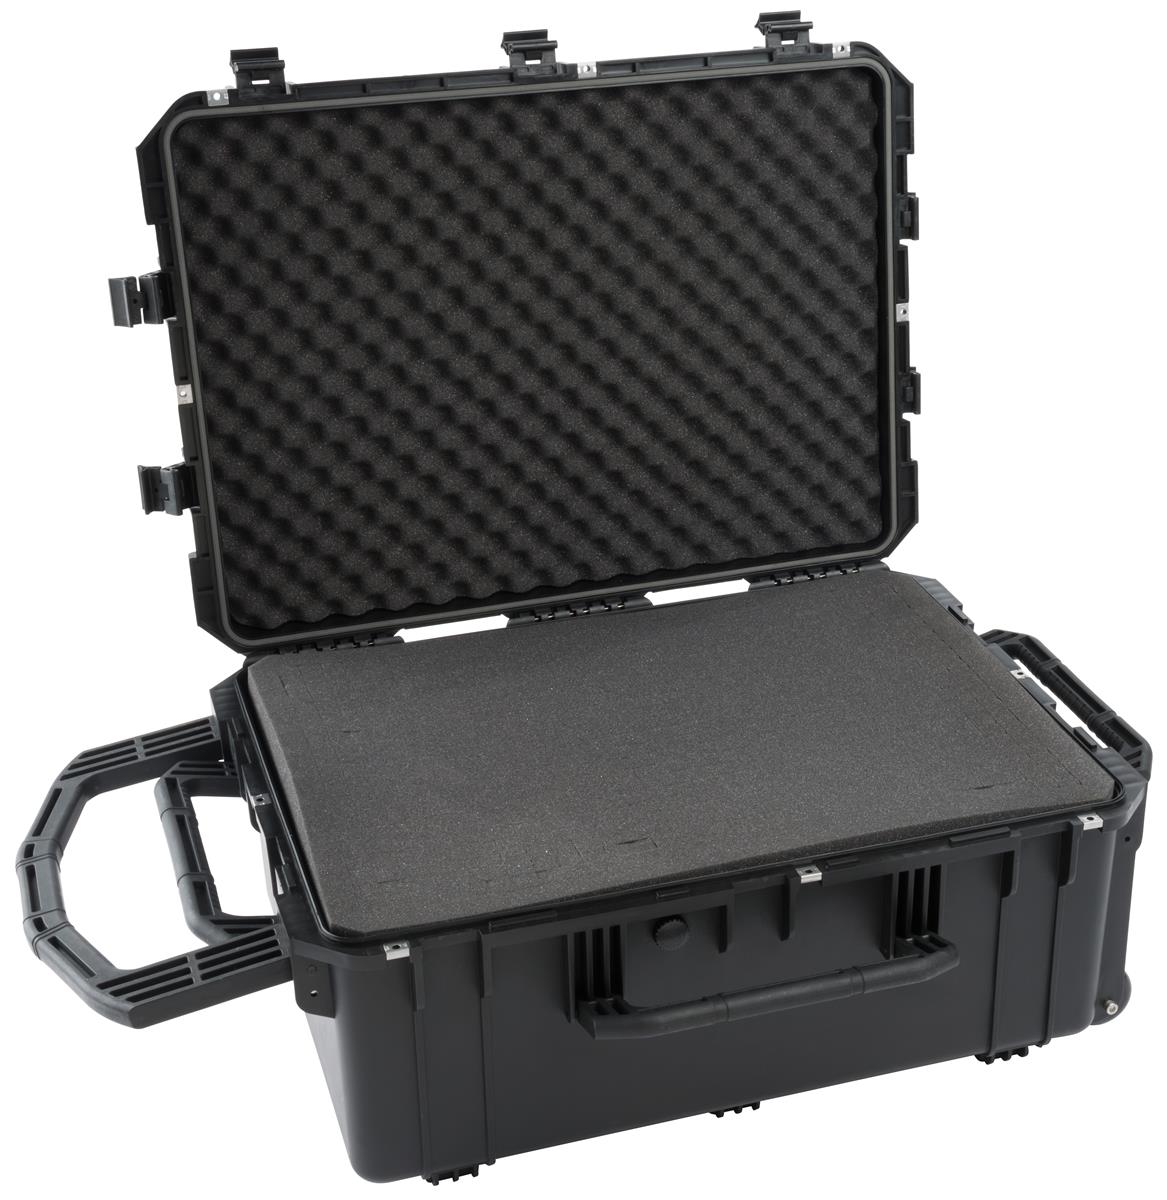 Waterproof Cubed Foam Equipment Case Customizable Padded